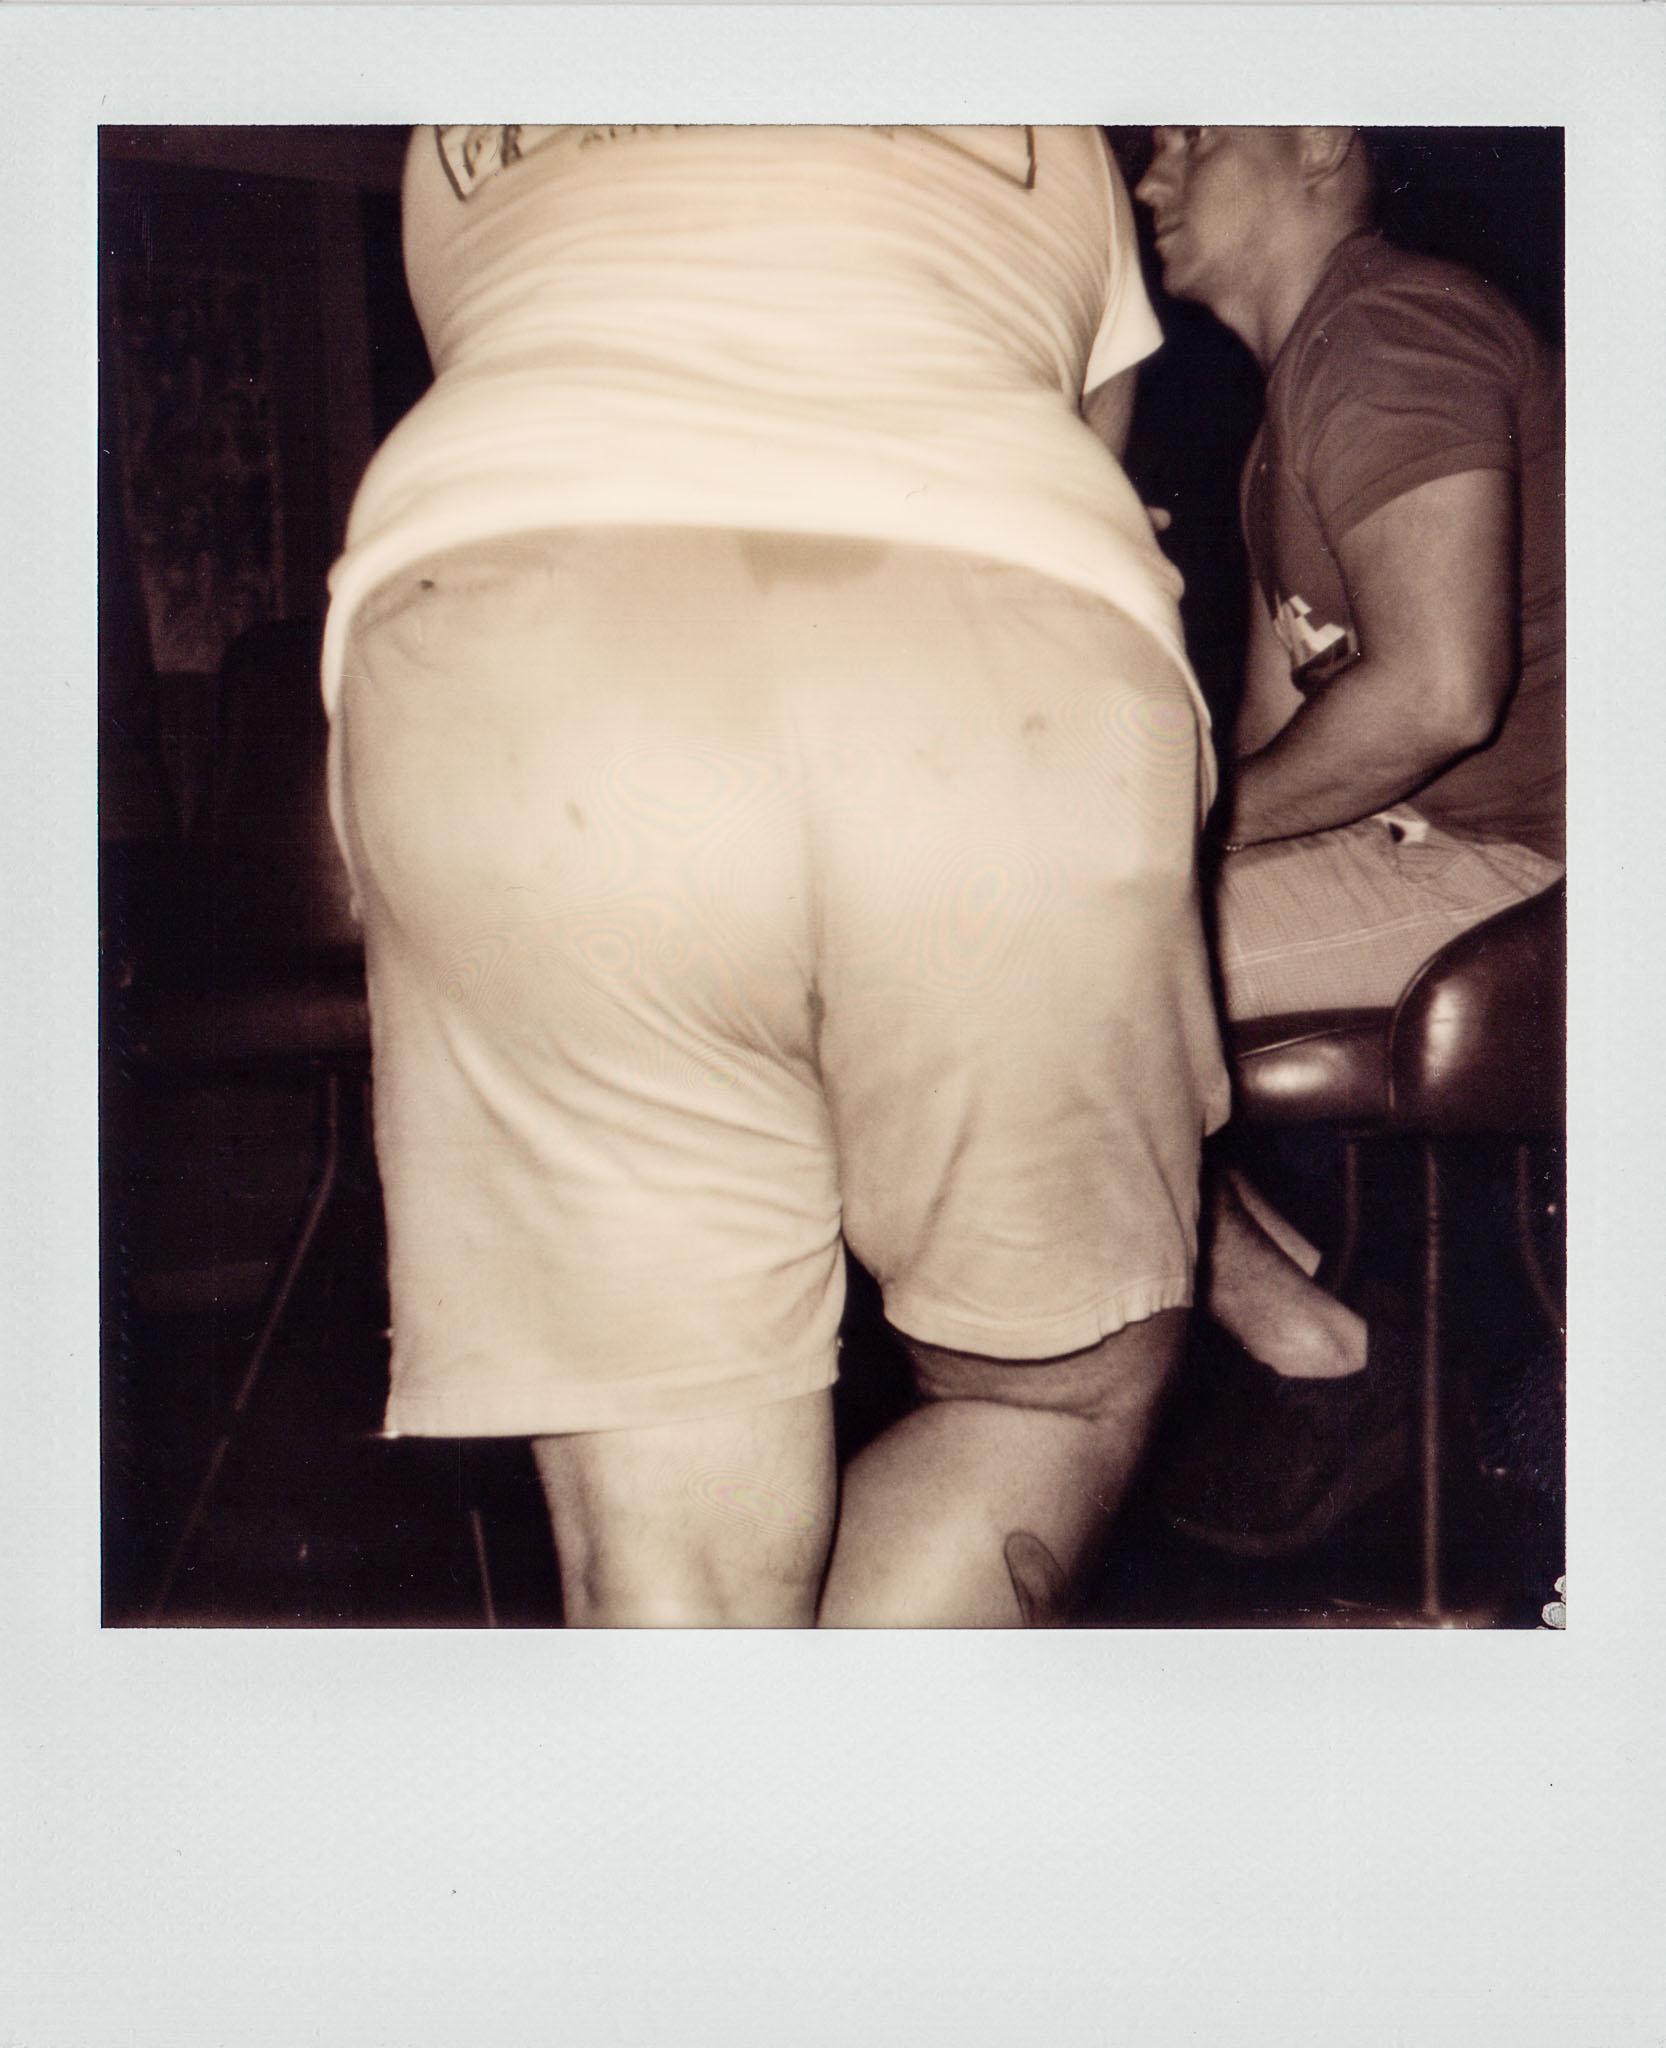 Jordan-eichenblatt-butt-polaroid.jpg